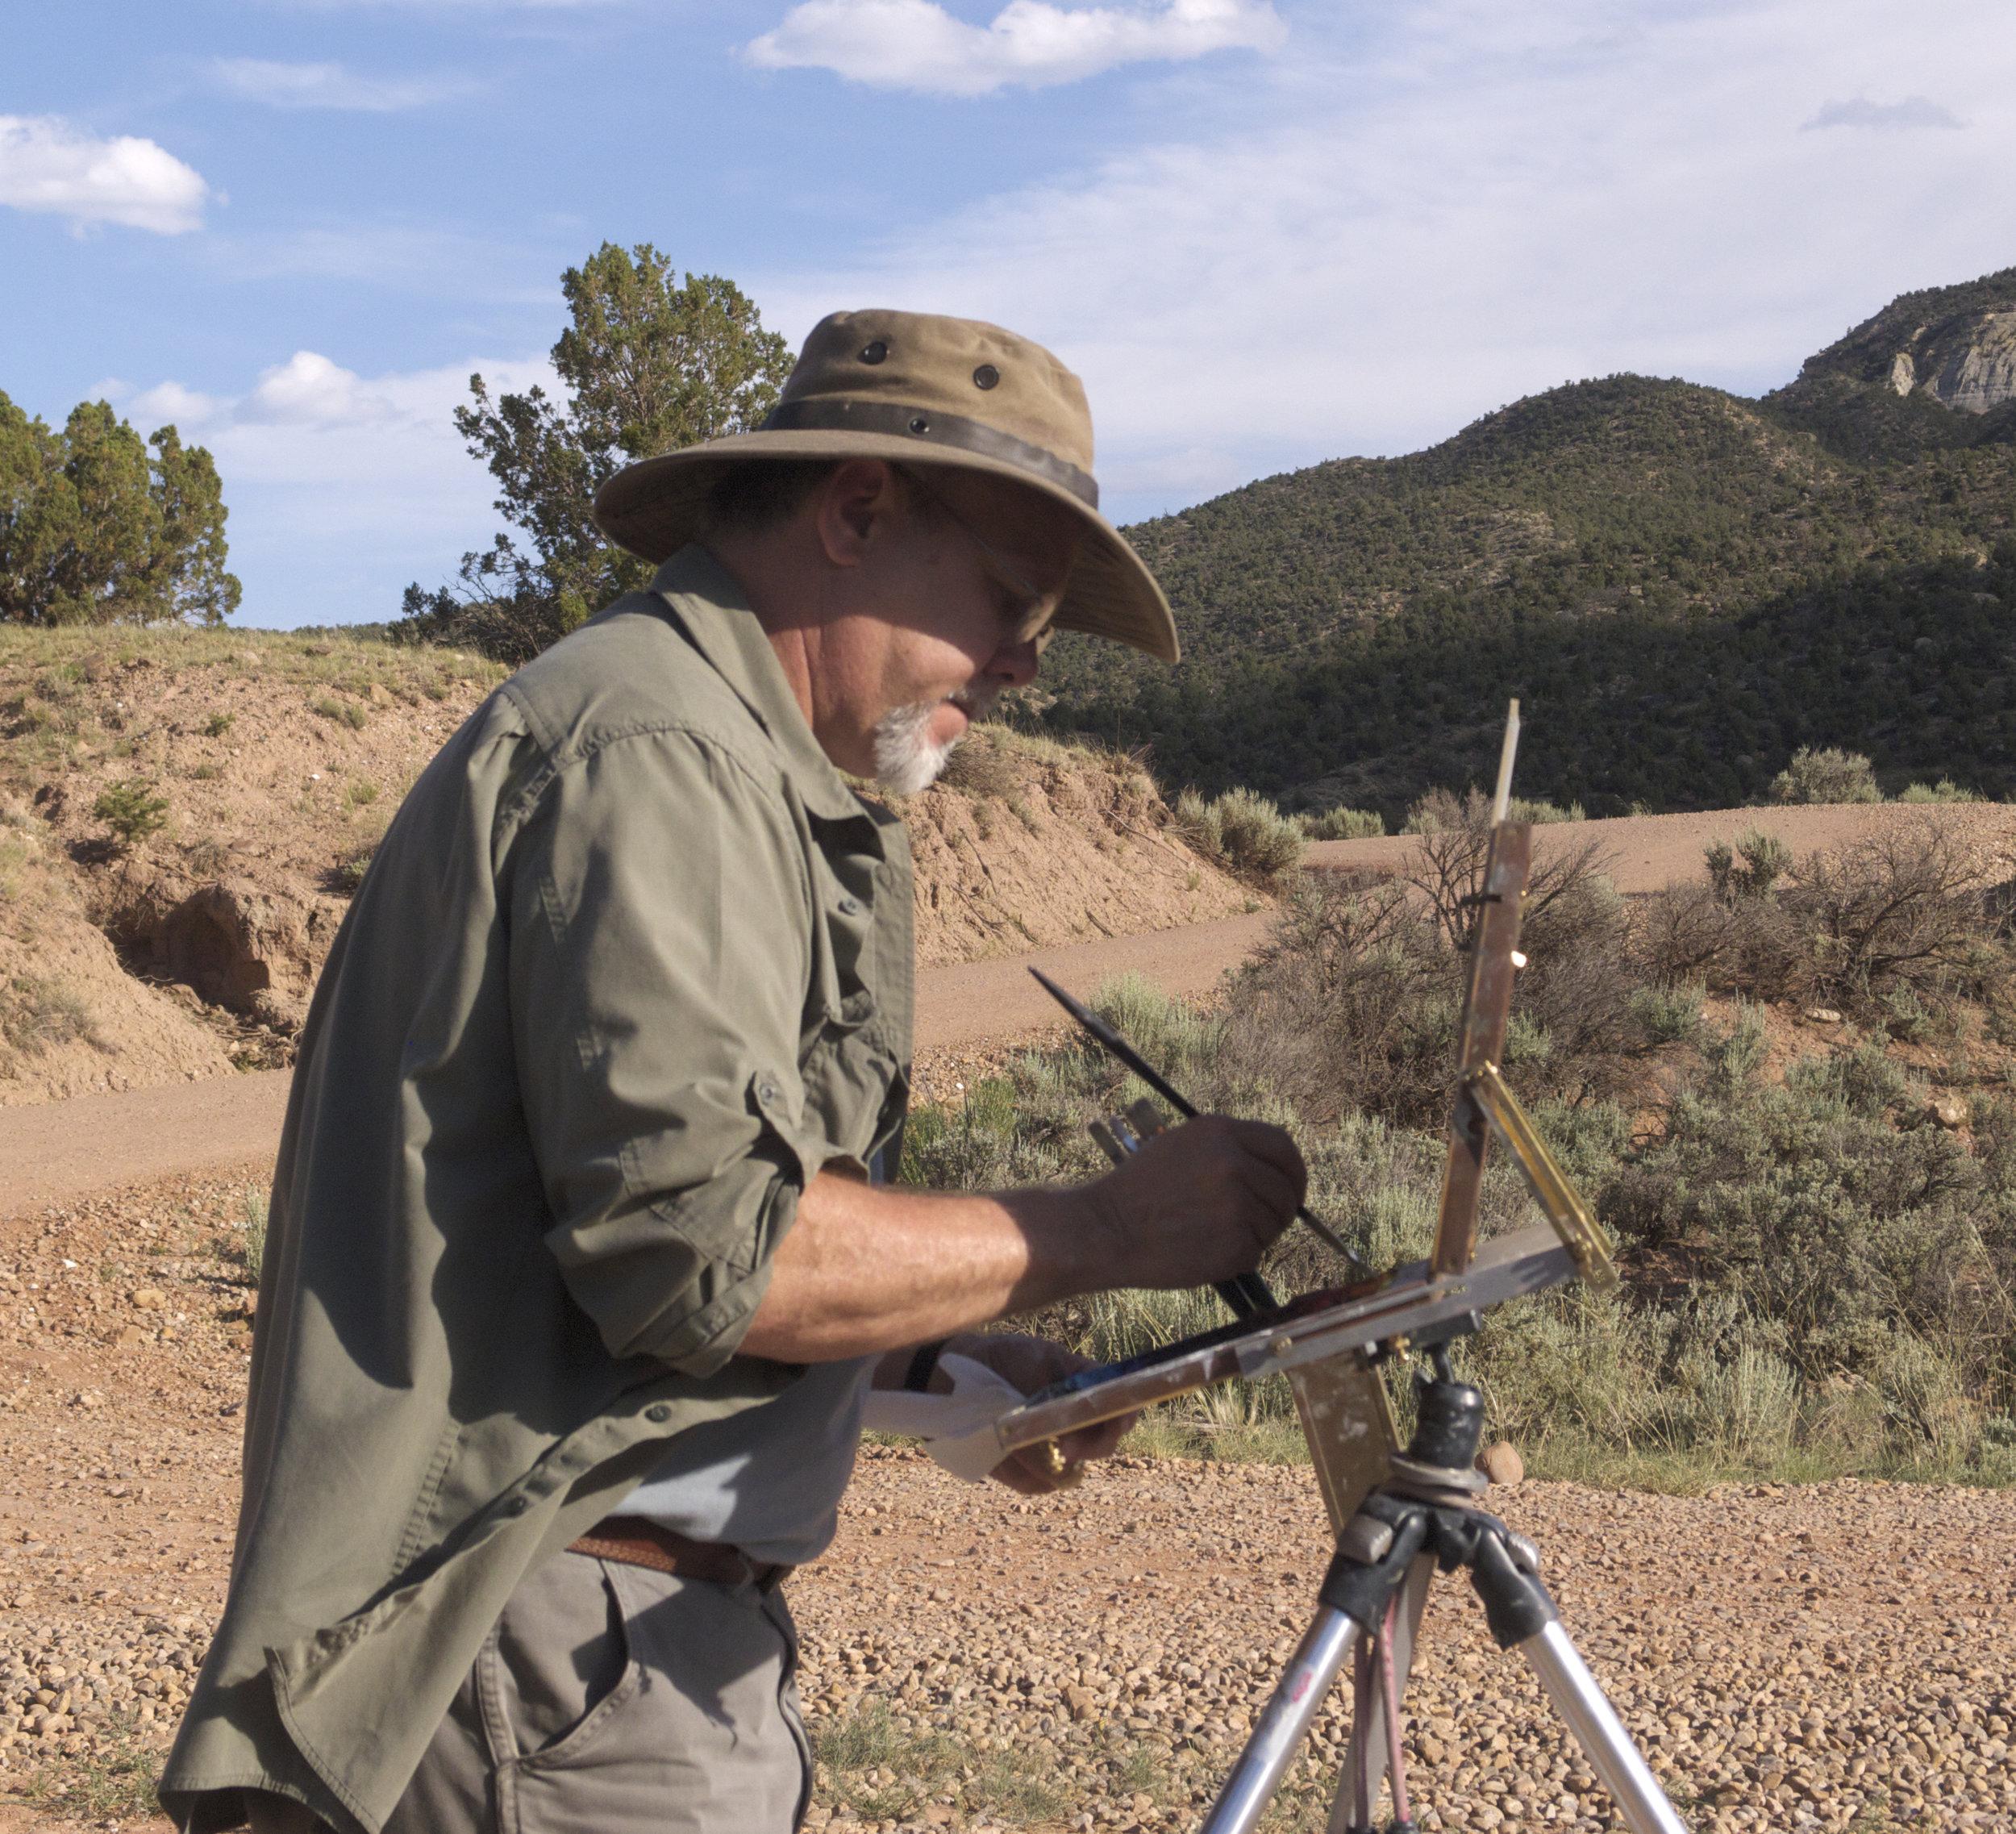 New artist Richard Prather painting outdoors.